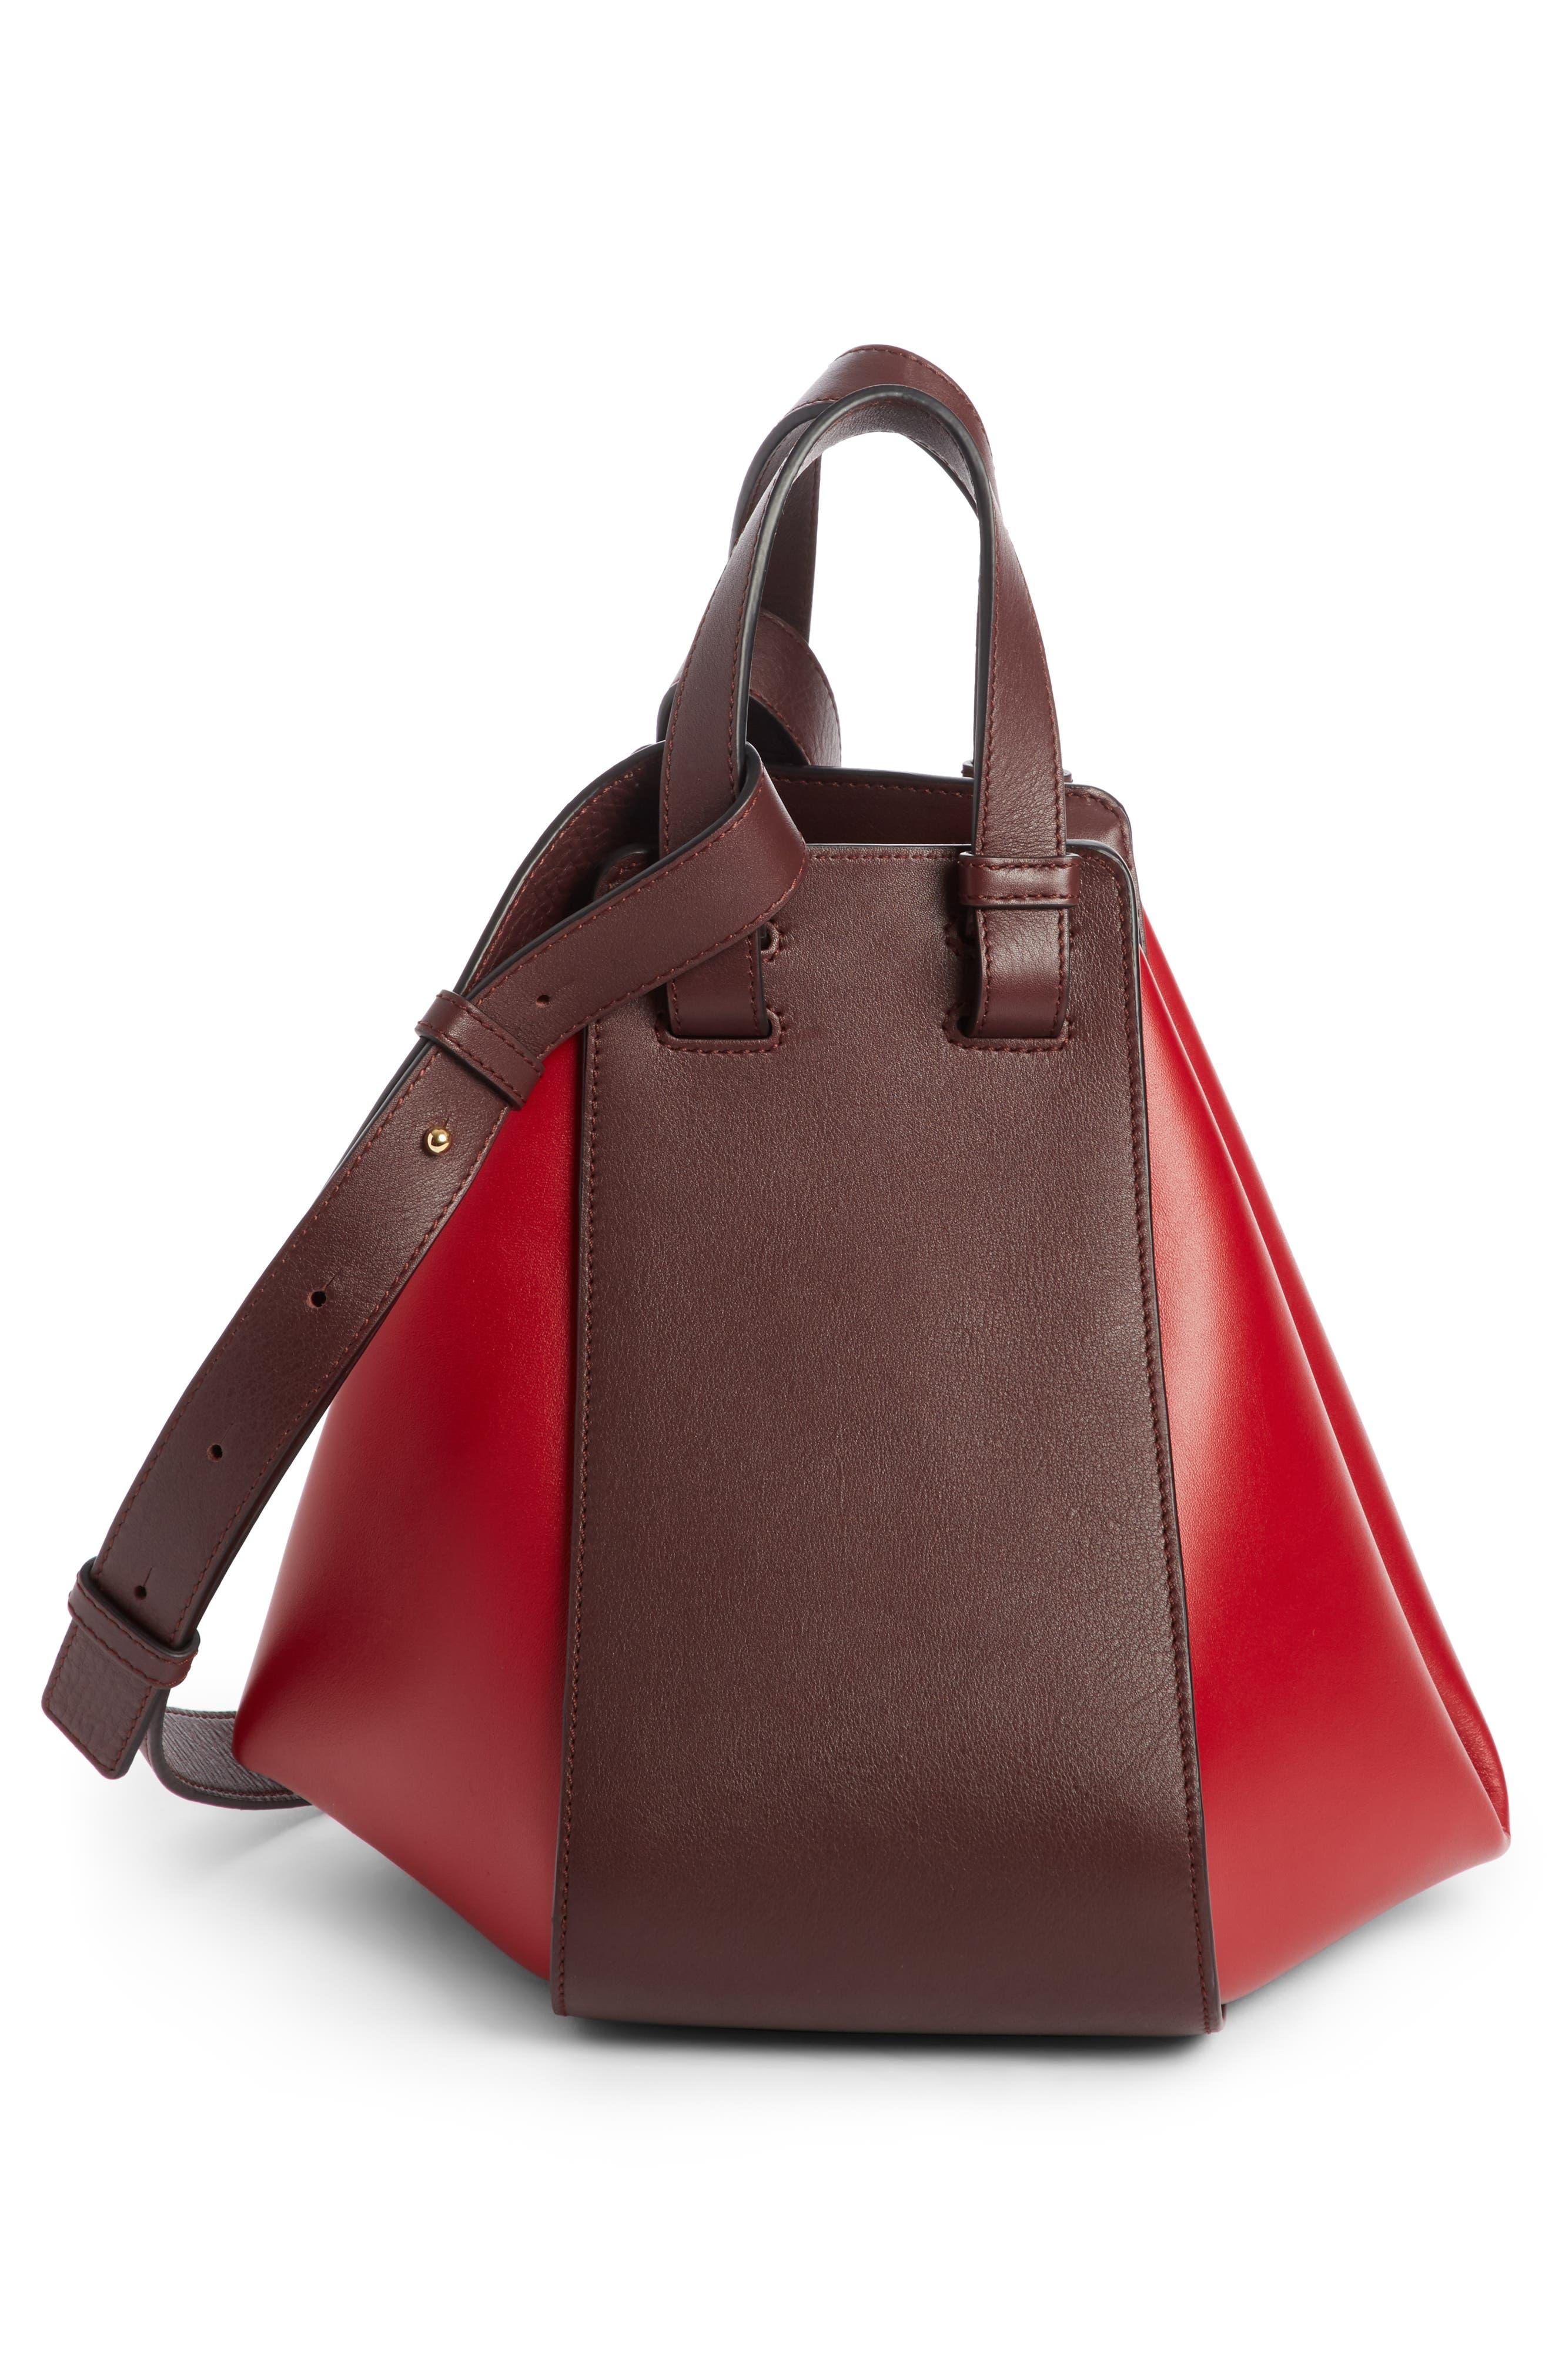 Main Image - Loewe Small Hammock Leather Shoulder Bag